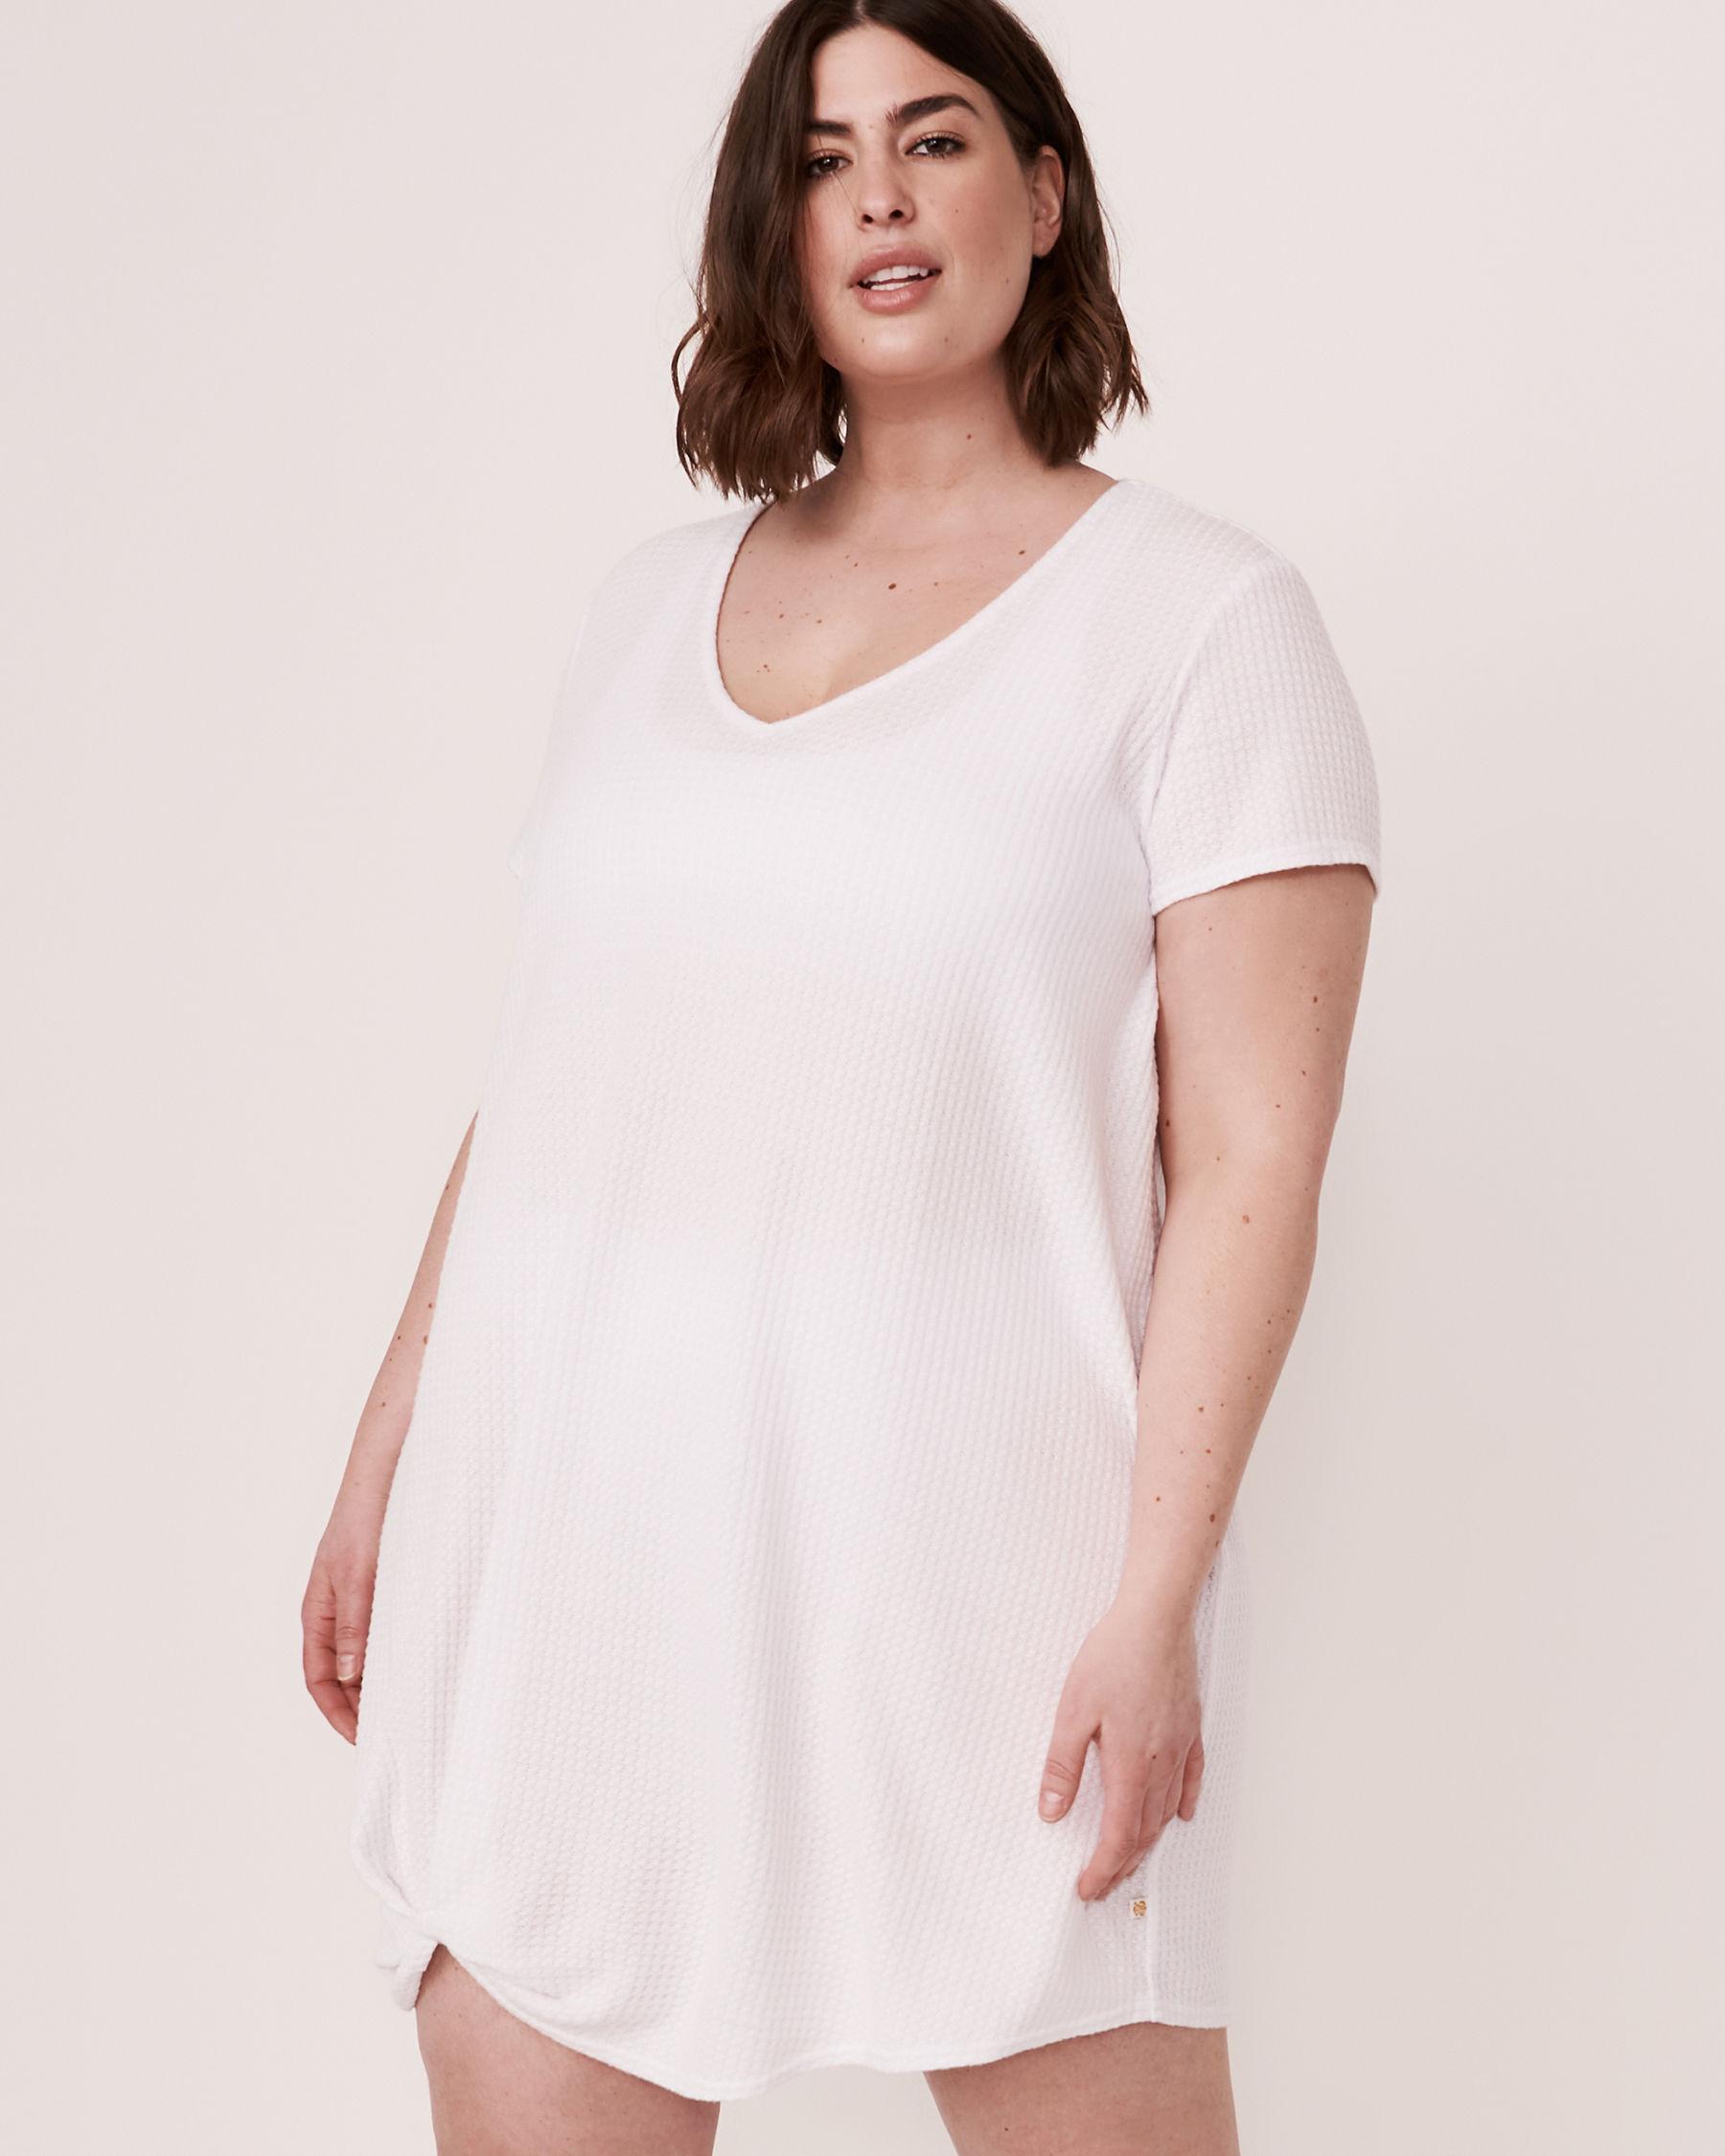 LA VIE EN ROSE AQUA Twisted Short Dress White 80300017 - View1